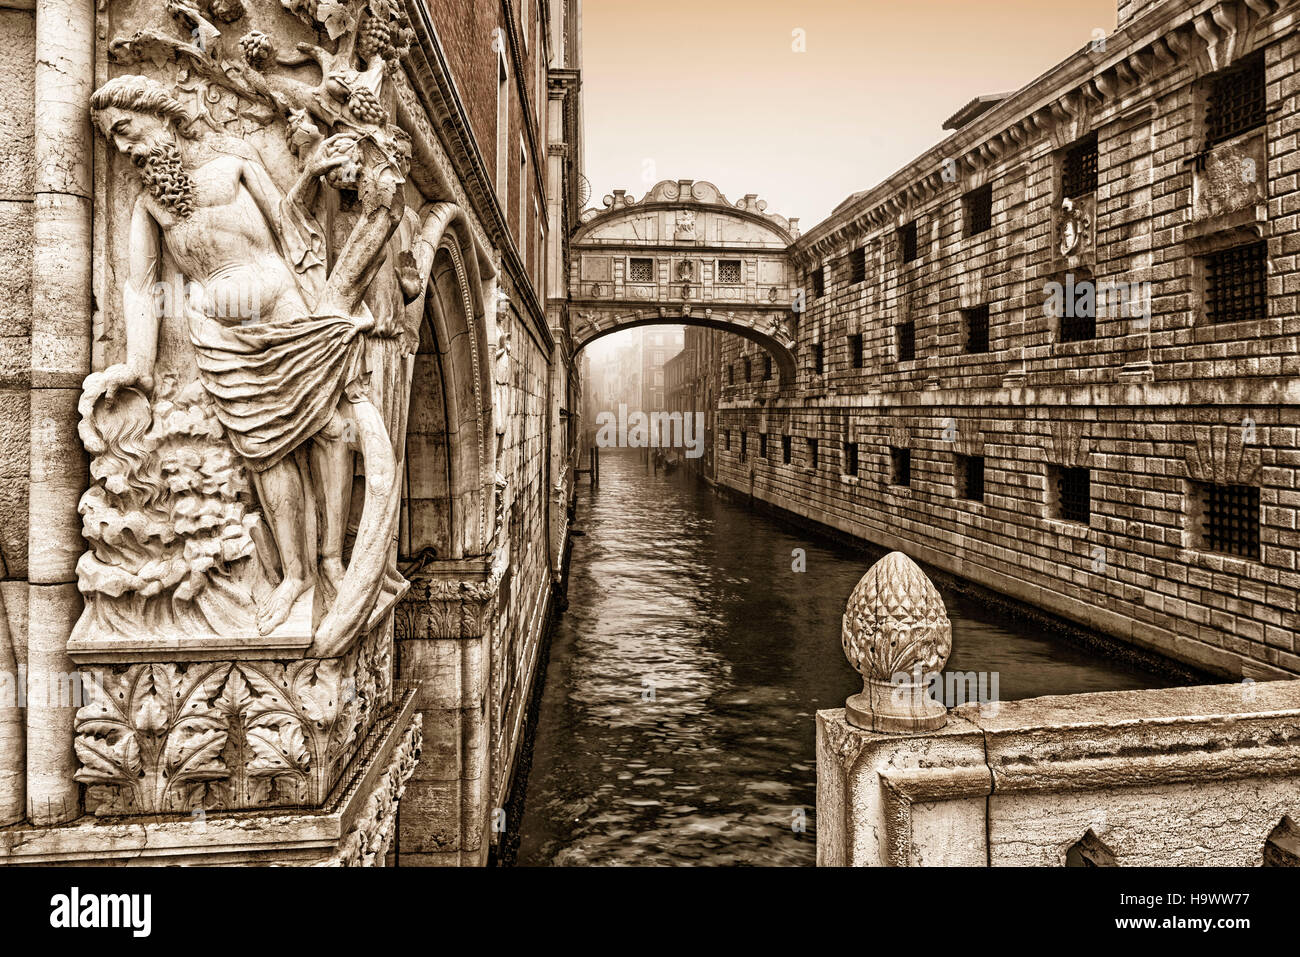 Bridge of Sighs, Venedig, Venezia, Venice, Italia, Europe, - Stock Image